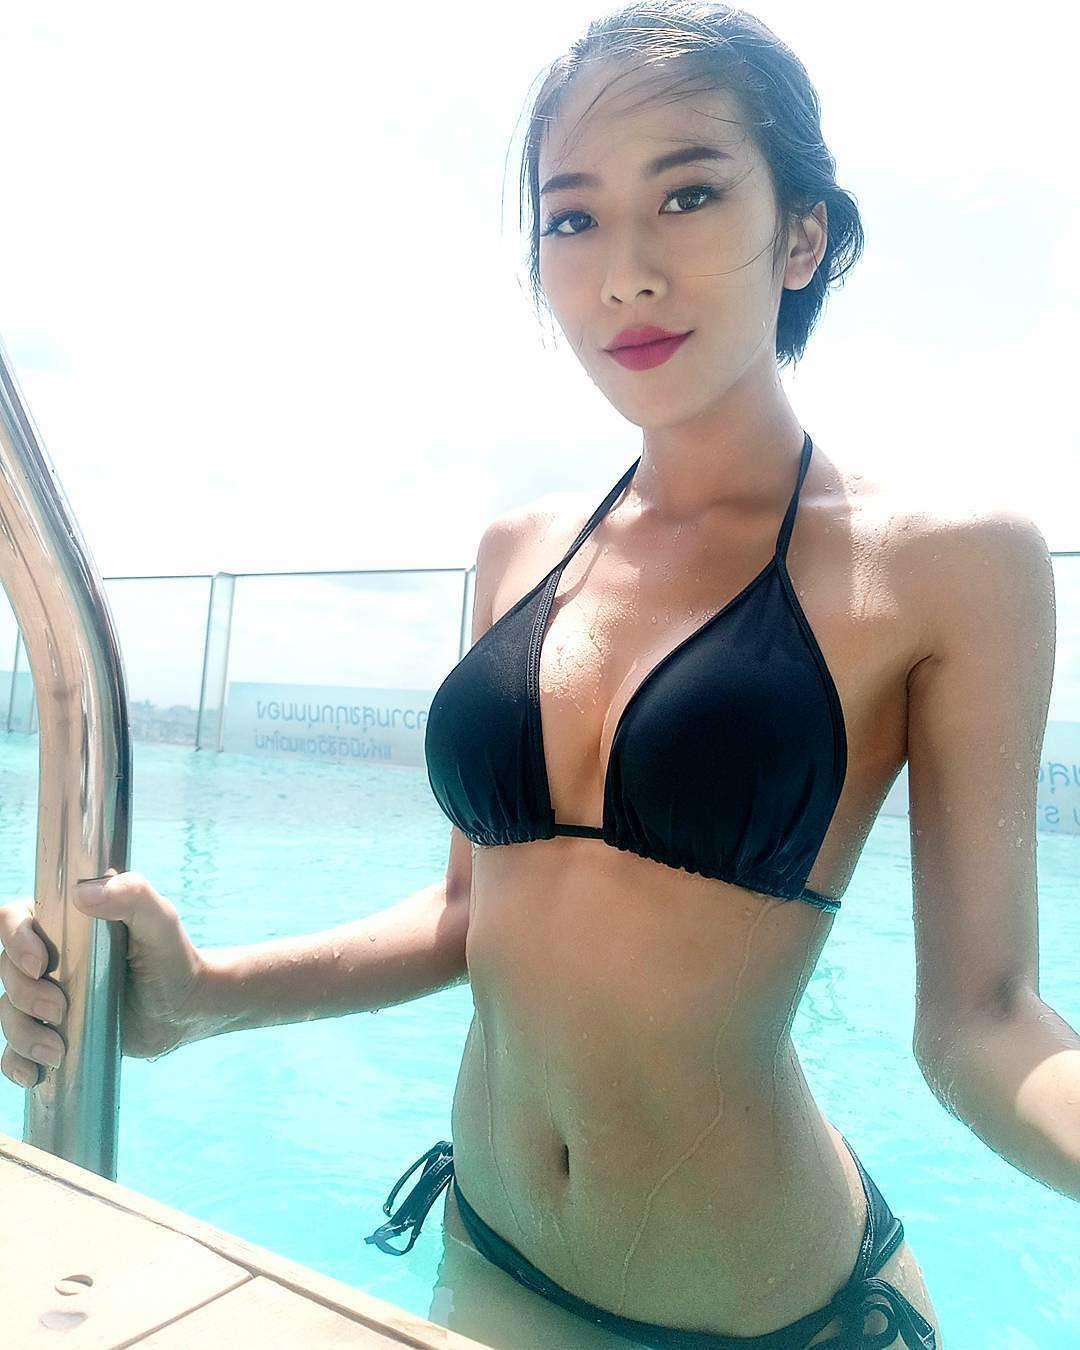 Oriental bikini babe pics